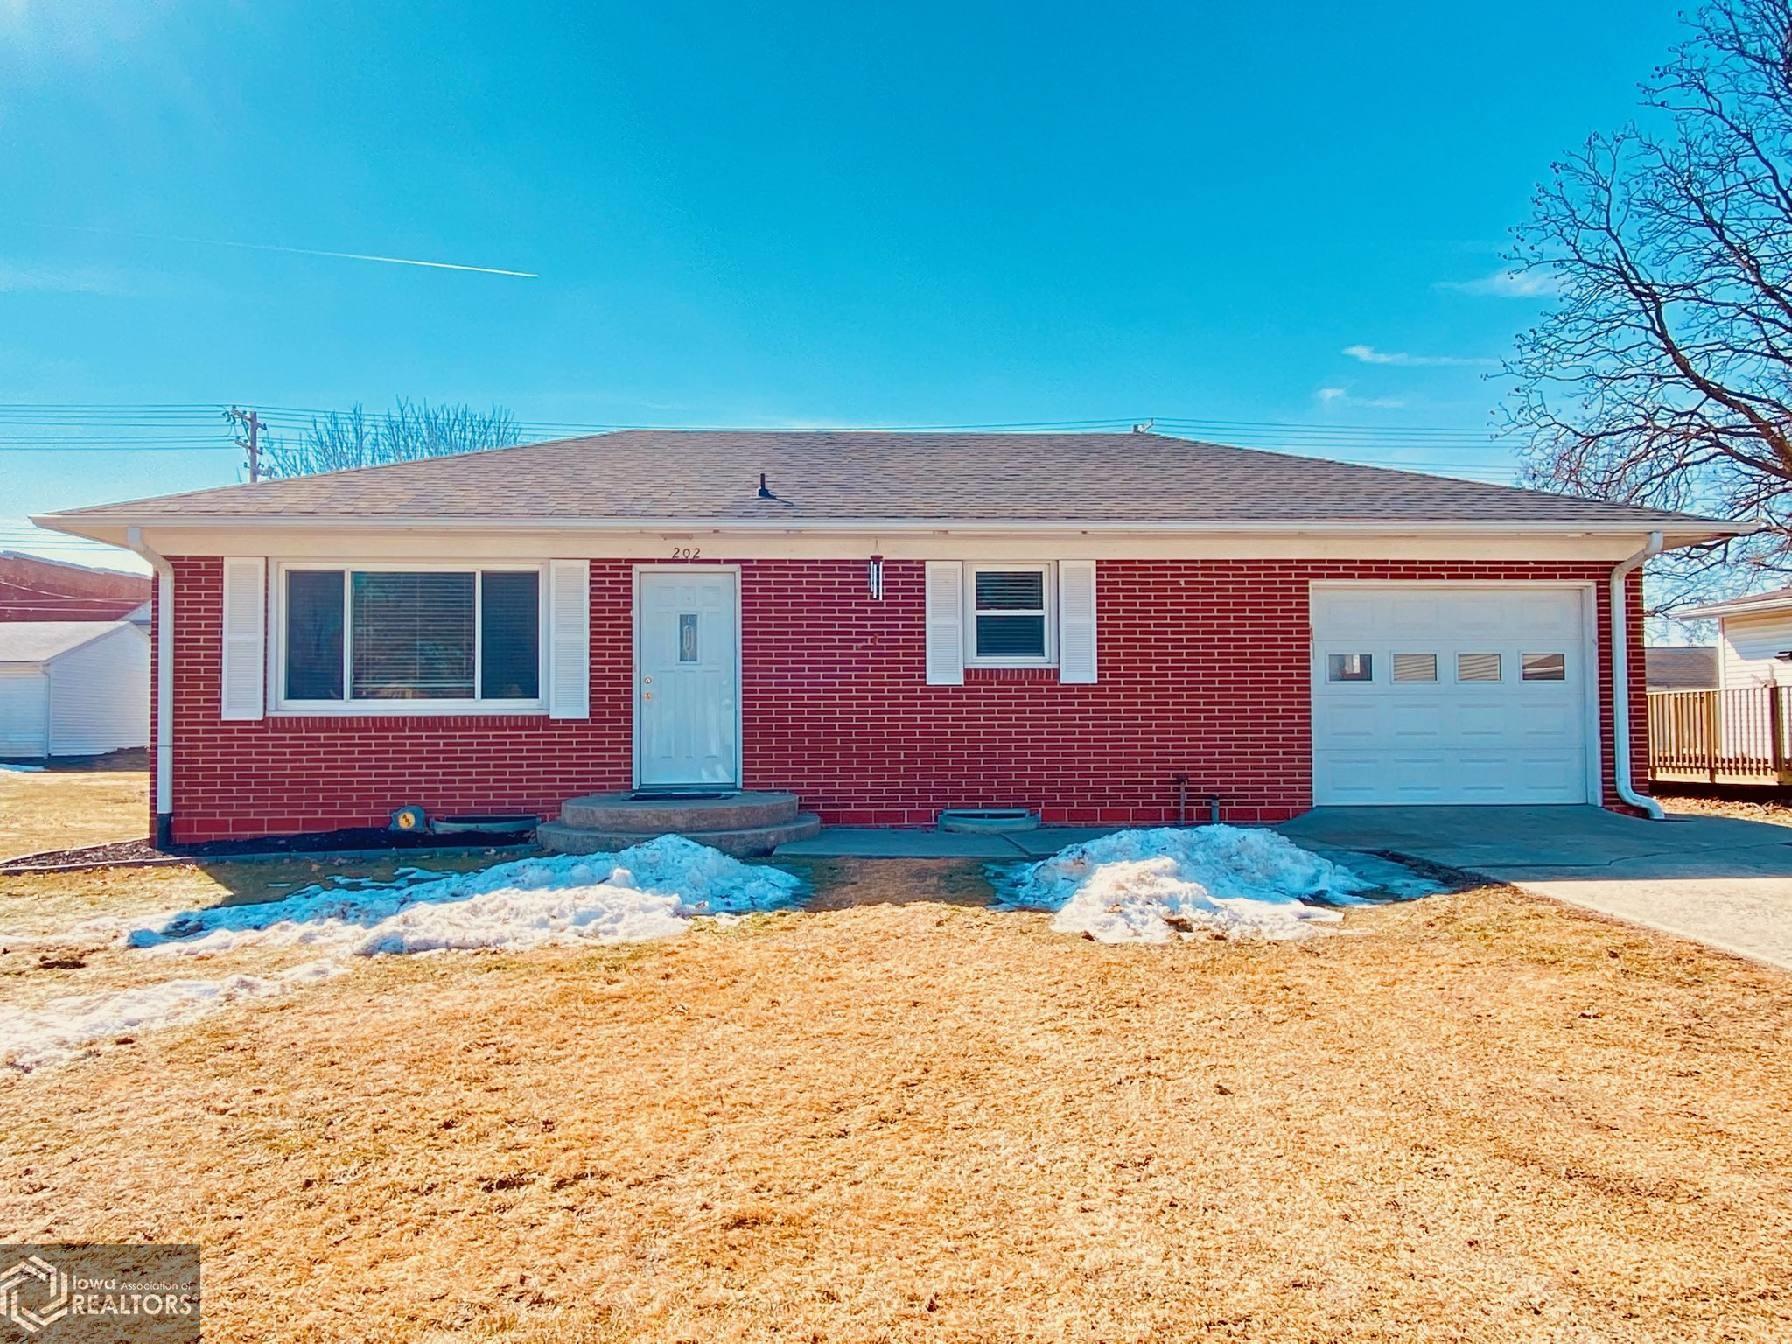 202 Washington, Montezuma, Iowa 50171-0086, 2 Bedrooms Bedrooms, ,1 BathroomBathrooms,Single Family,For Sale,Washington,5722222